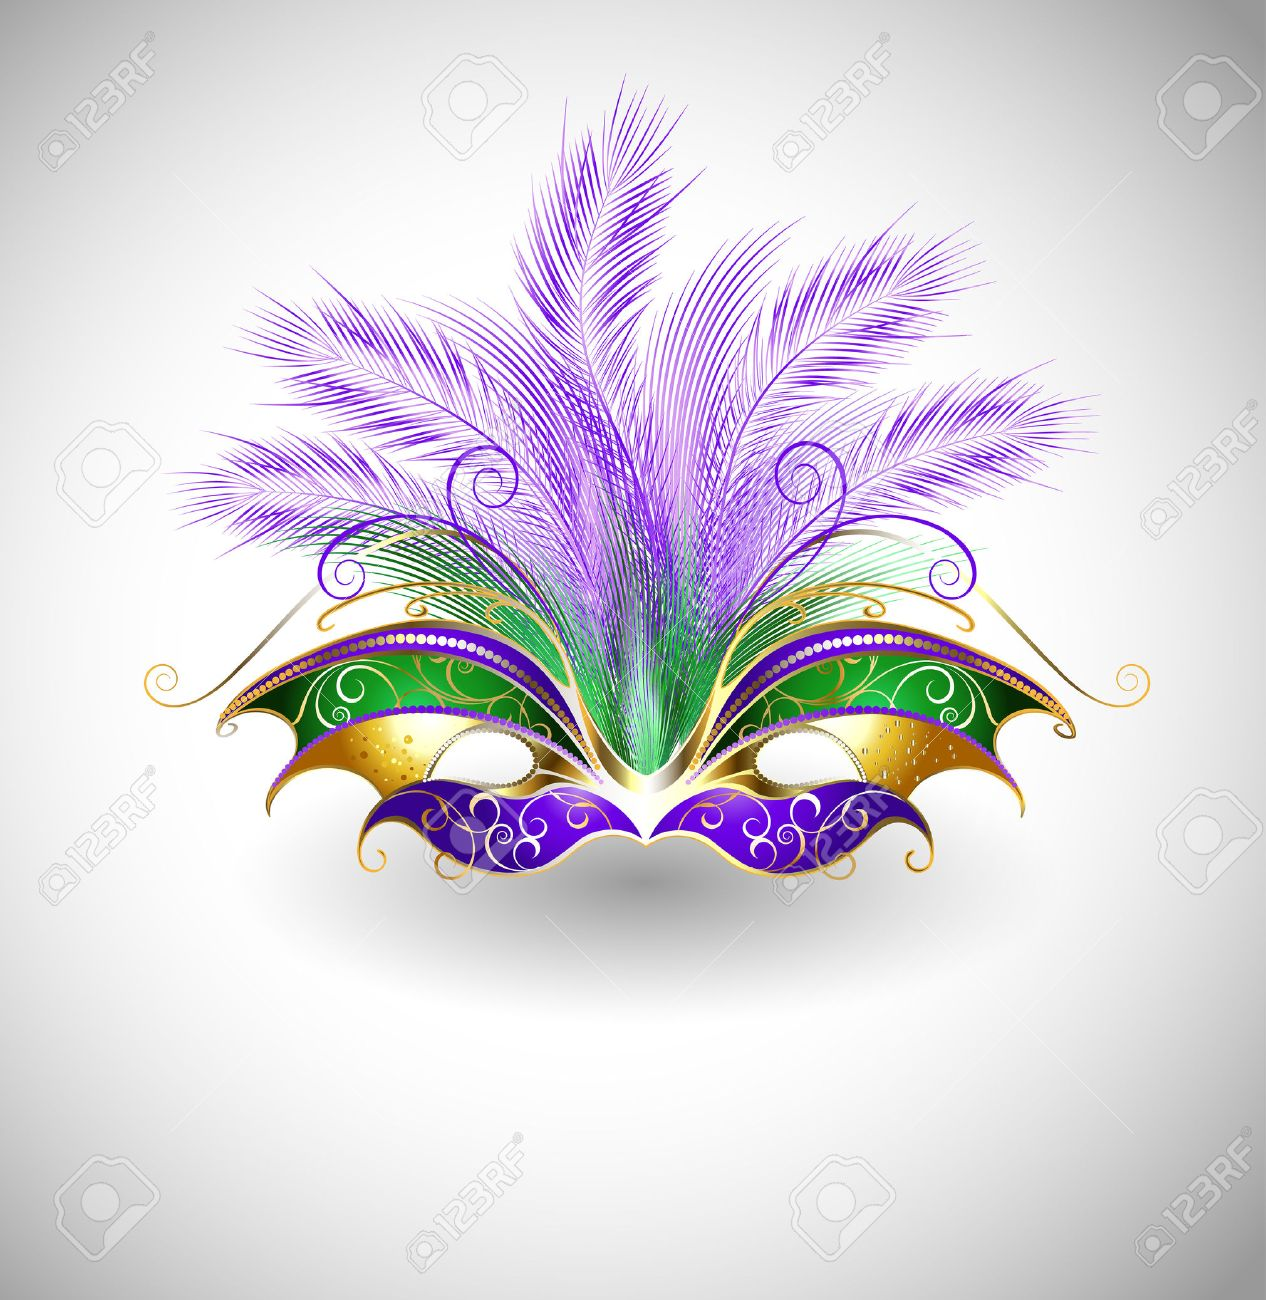 6 556 mardi gras mask cliparts stock vector and royalty free mardi rh 123rf com Mardi Gras Mask Cut Out mardi gras mask clipart free